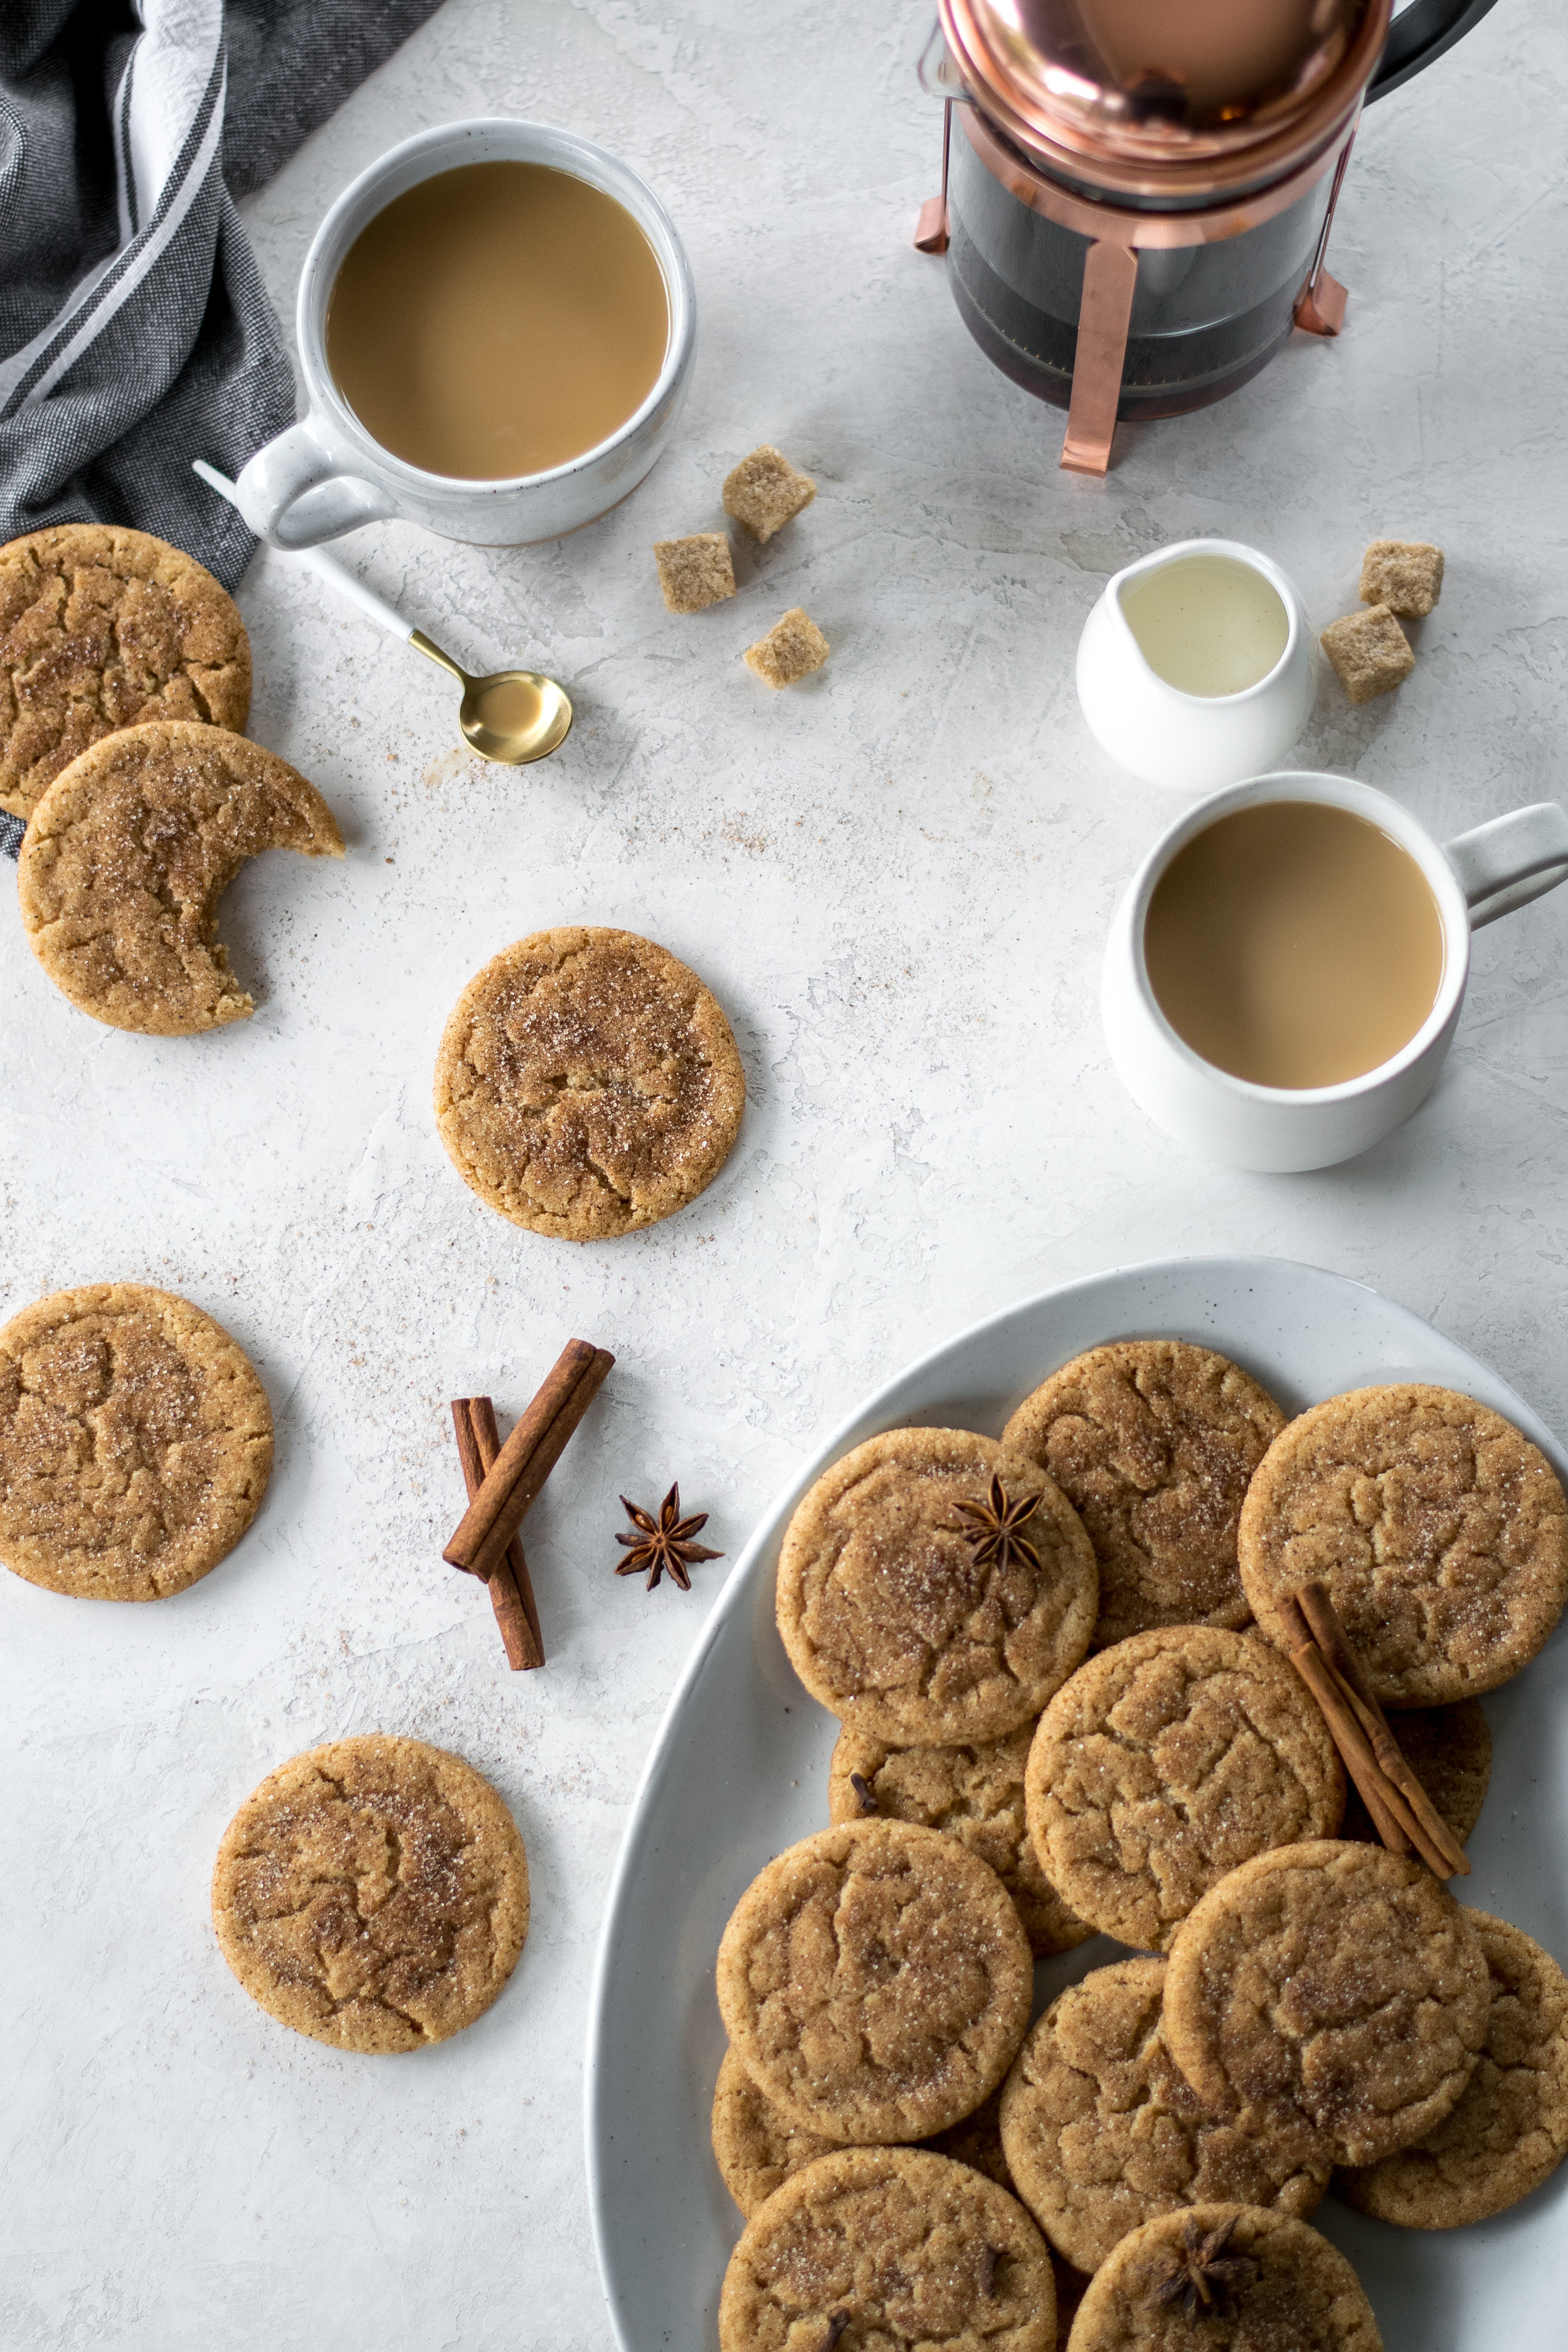 Brown Butter Hawaij-Spiced Snickerdoodles | All Purpose Flour Child